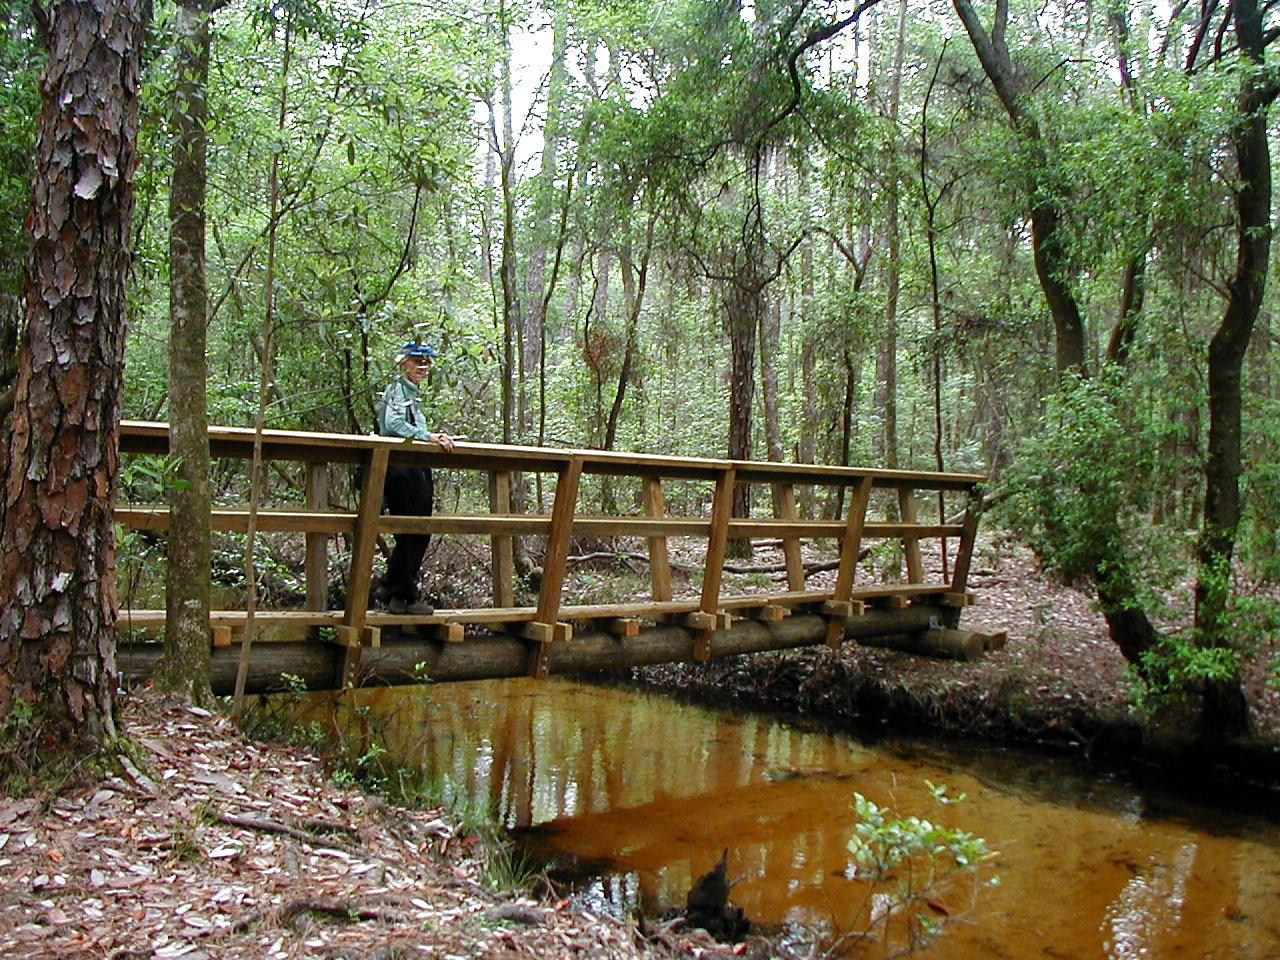 Florida Trail bridge crossing, Eglin AFB<br /> PHOTO CREDIT: Deb Blick / Florida Trail Association